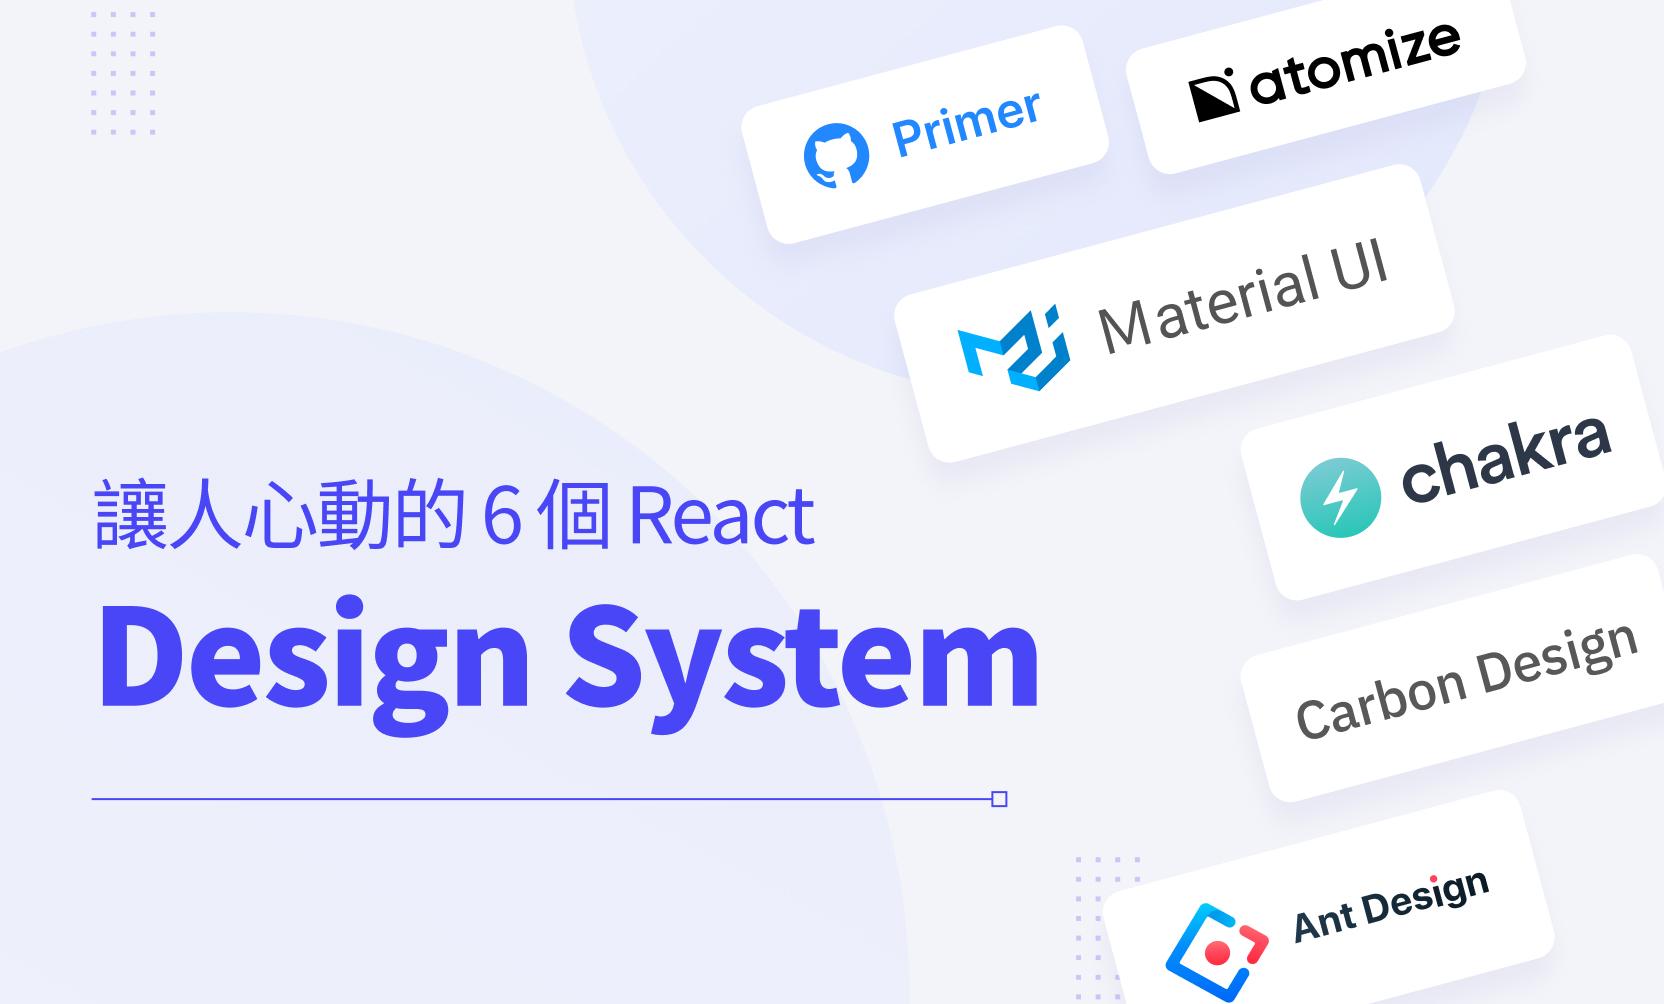 讓人心動的 6 個 React Design Systems - cover